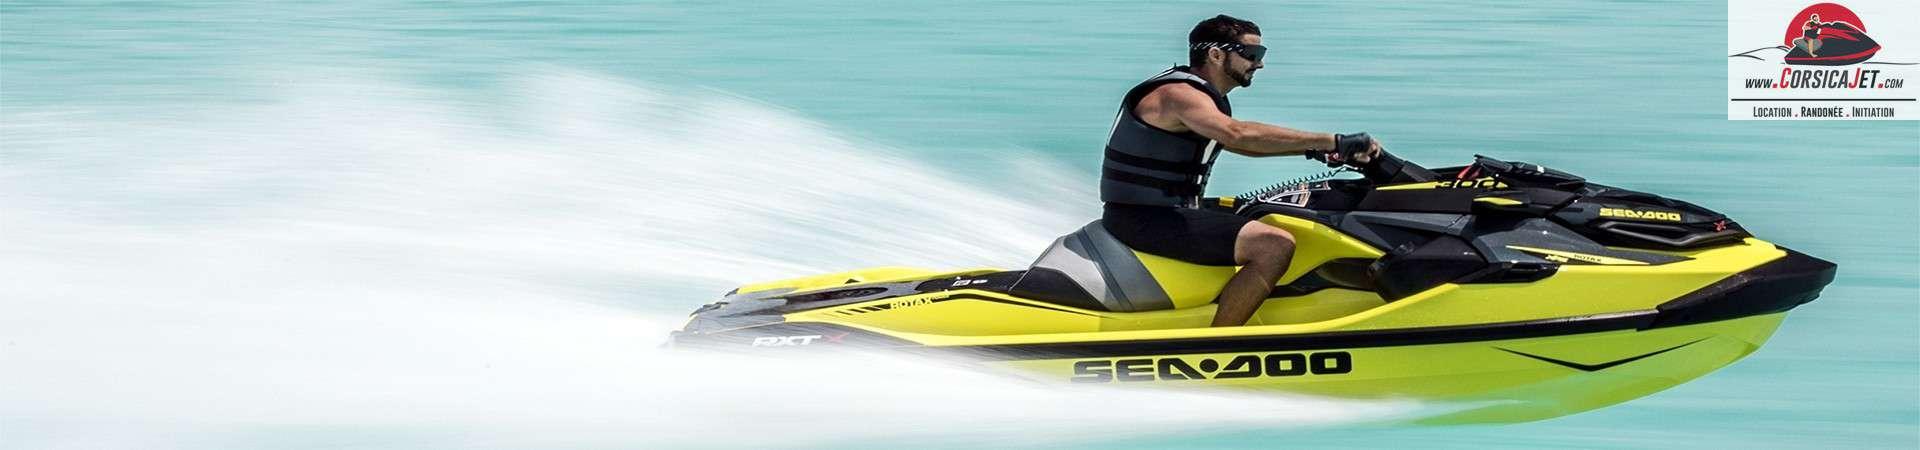 initiation sans permis 30 corsica jet ski porto vecchio